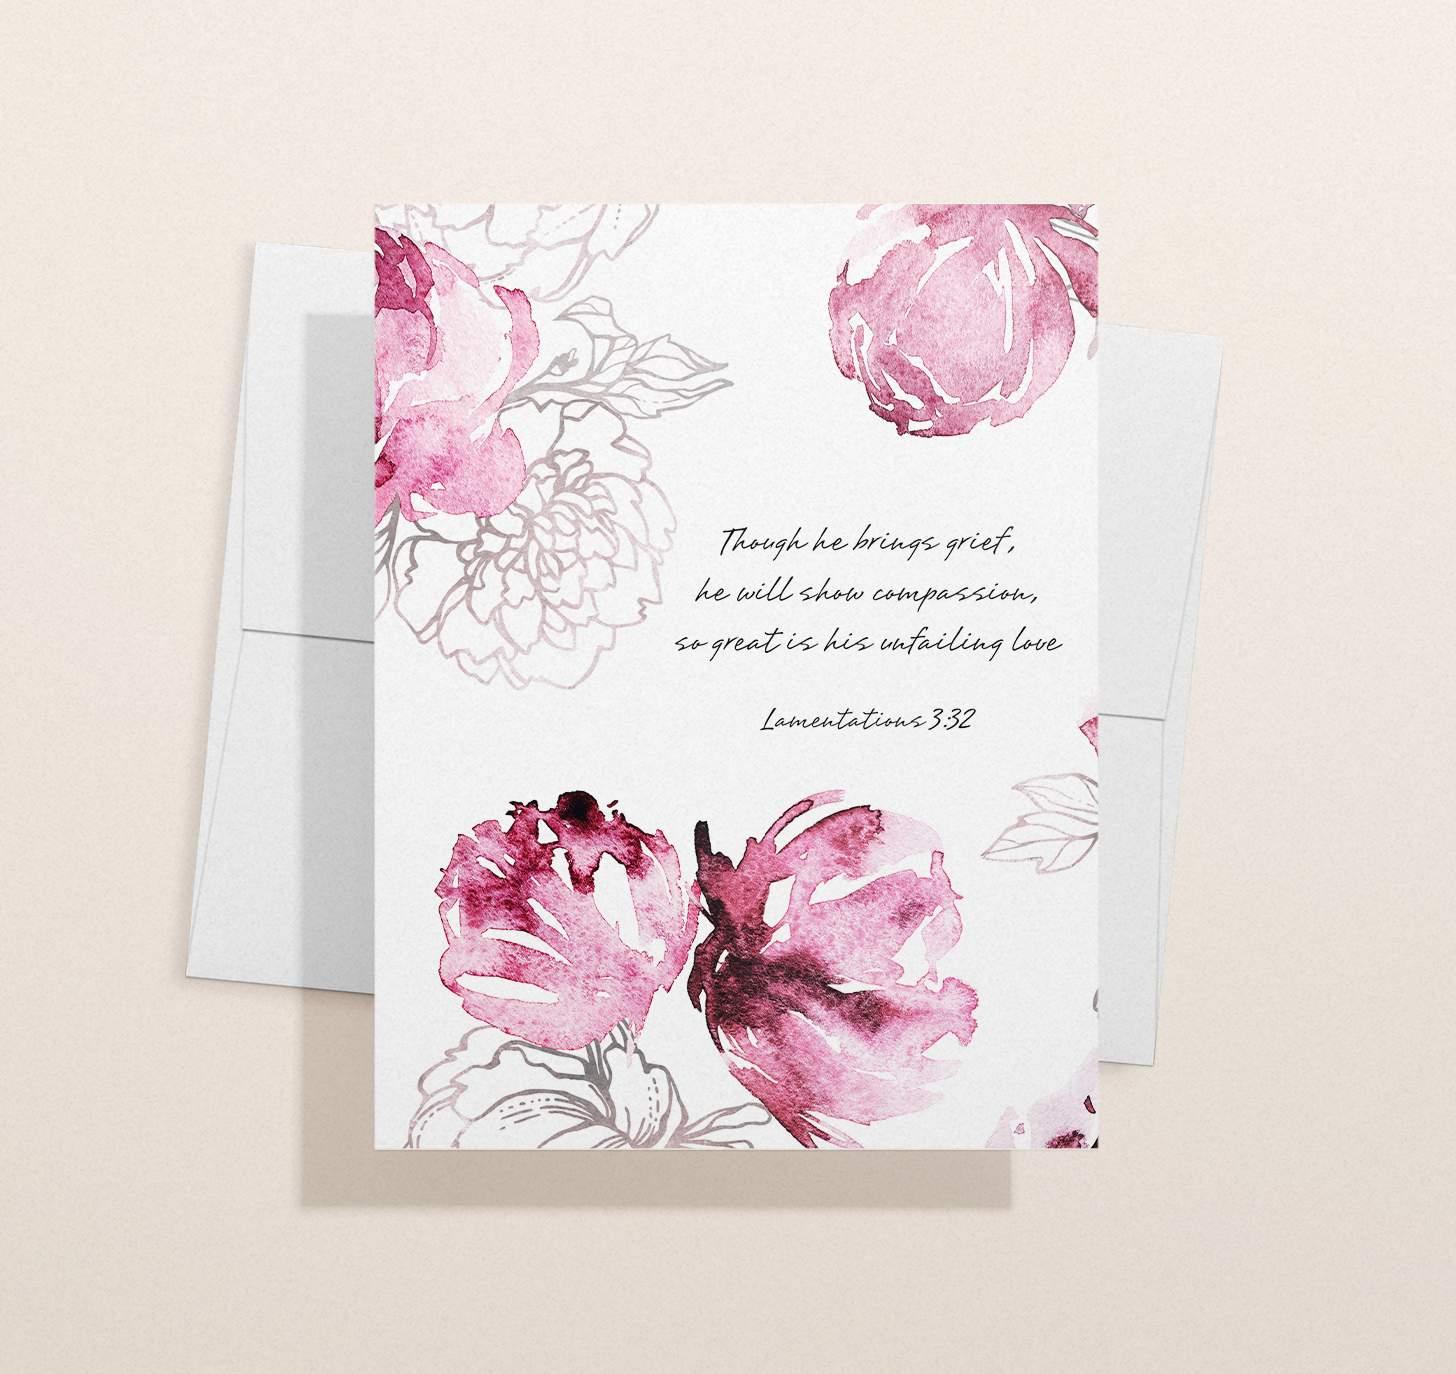 Pink floral themed sympathy design with envelope